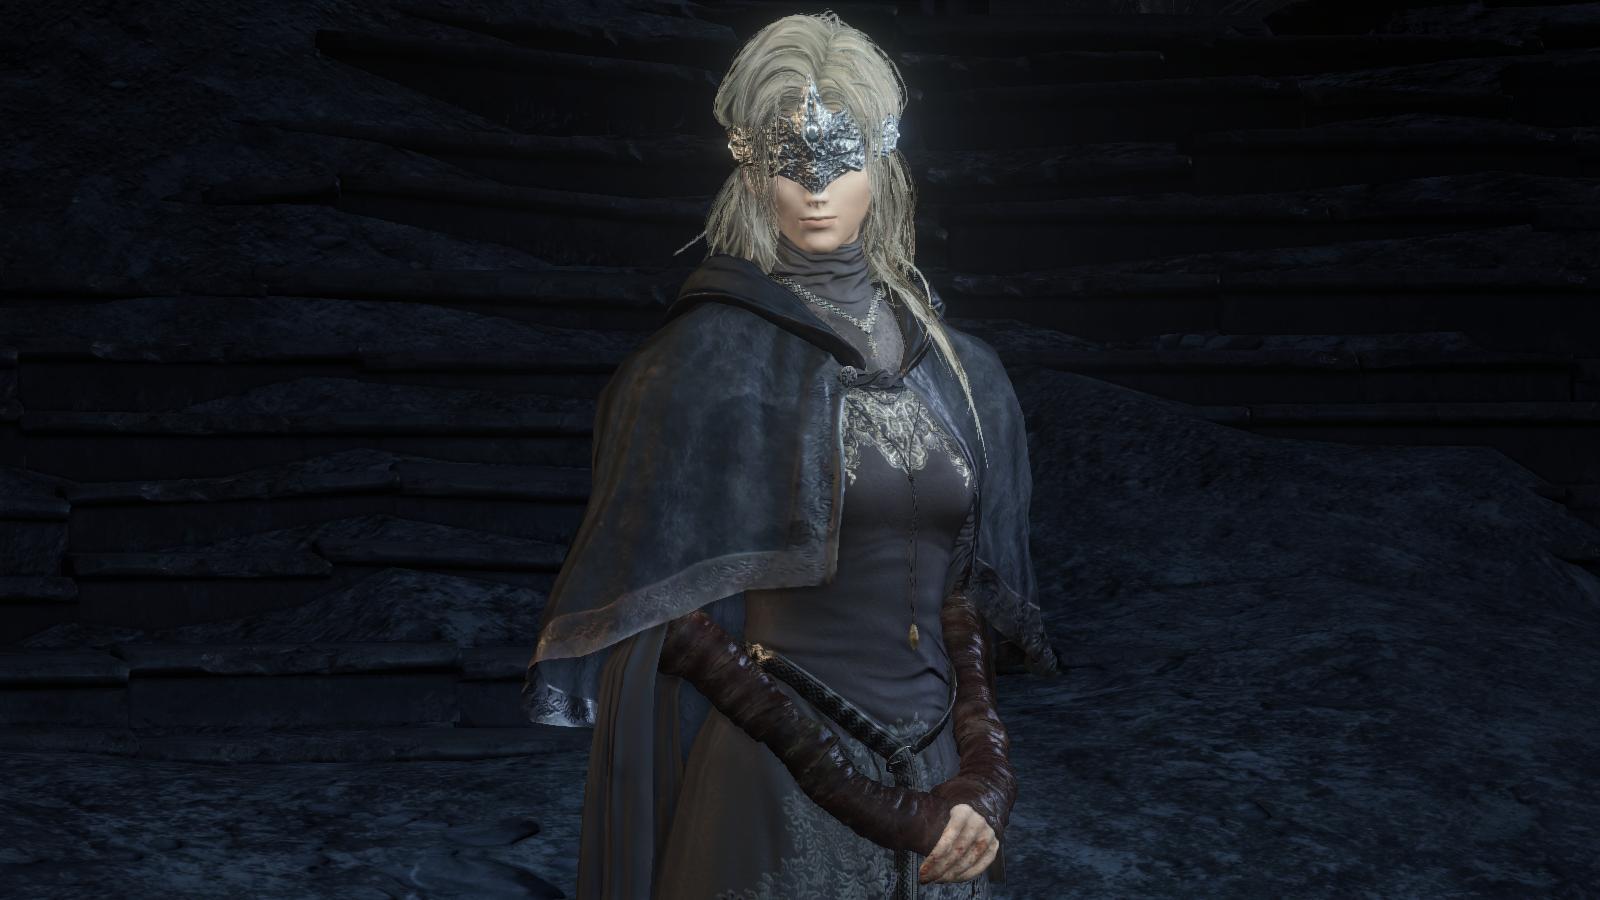 Dark Souls 3 Fire Keeper Cosplay: Image - Blind Fire Keeper.jpg